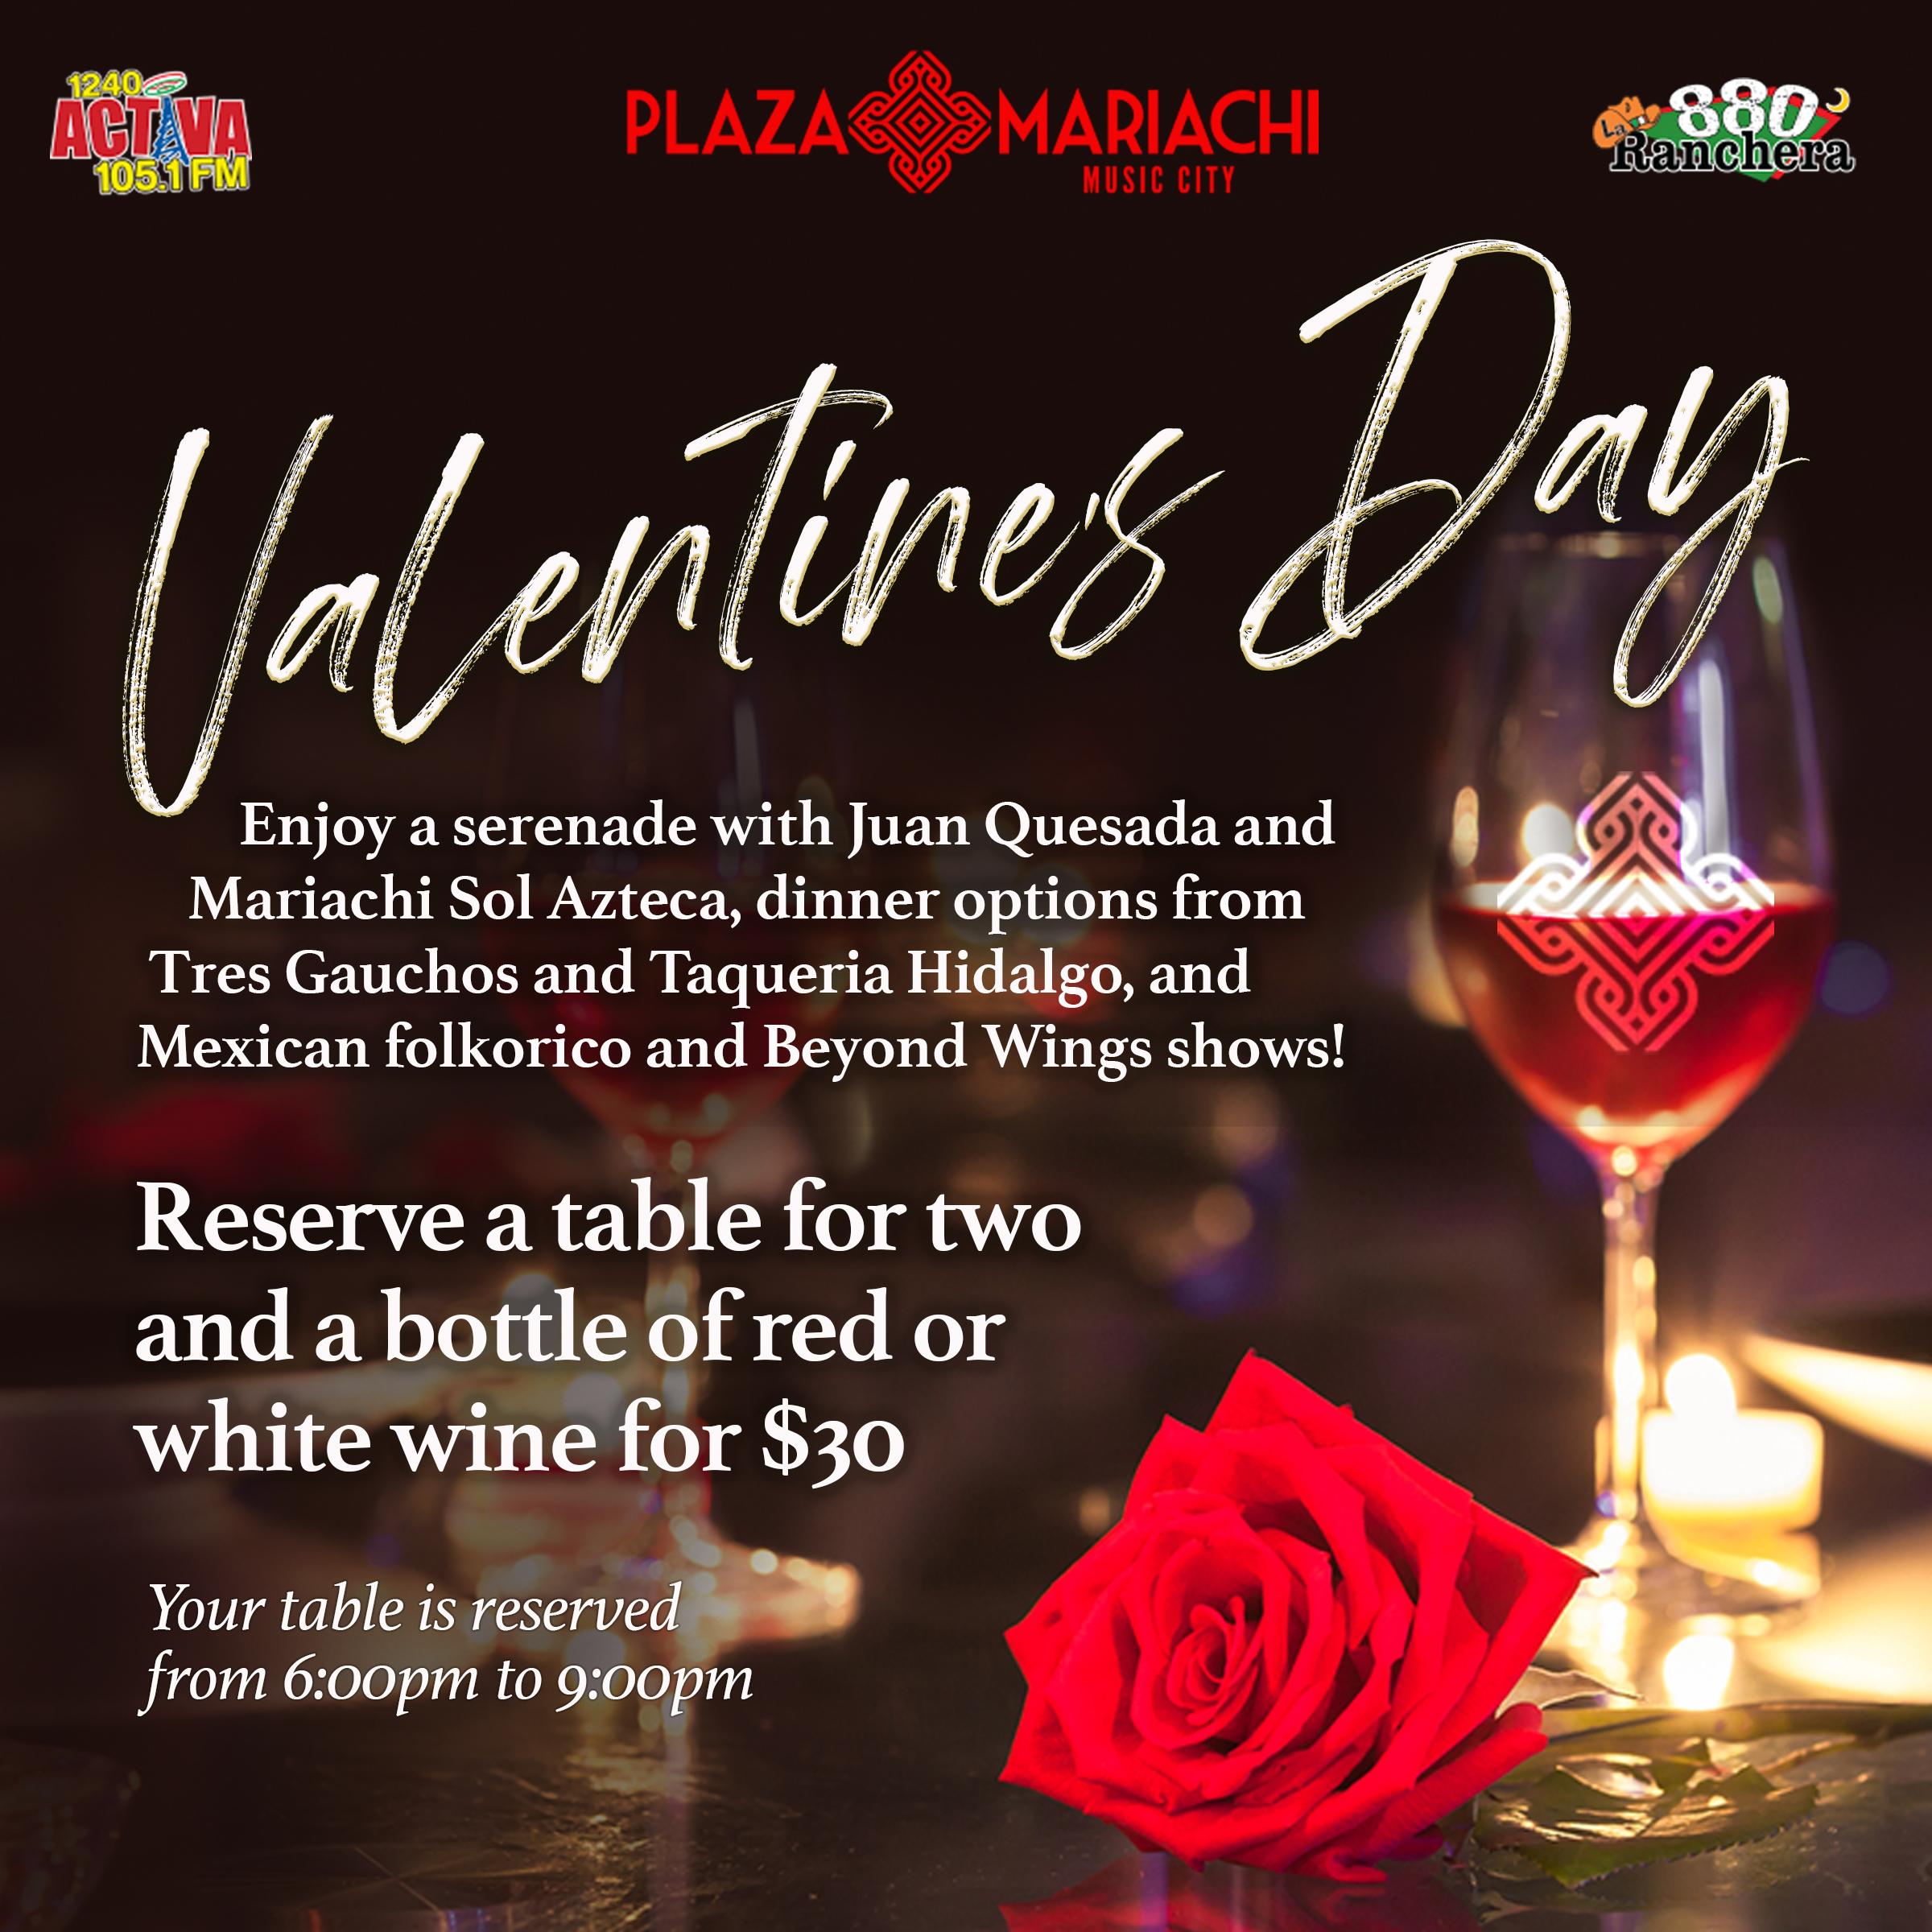 Valentine's Day at Plaza Mariachi